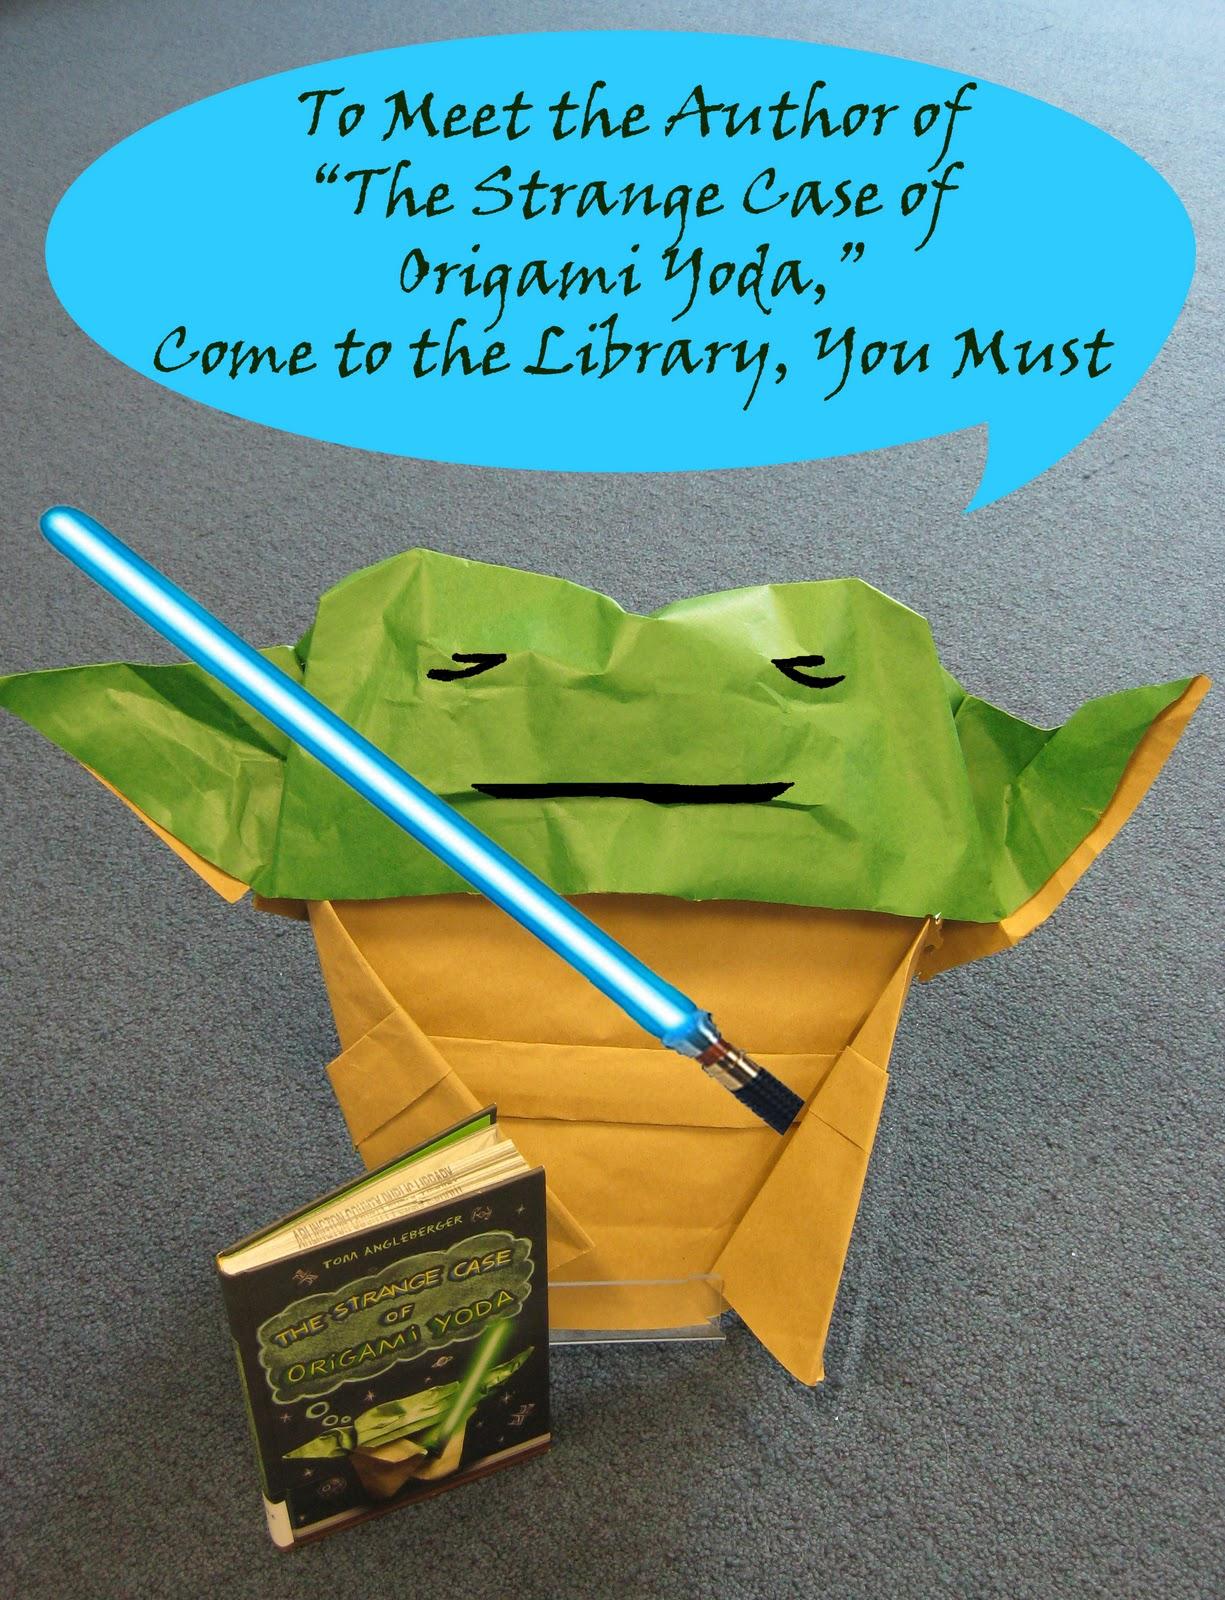 The Strange Case of Origami Yoda by Tom Angleberger - YouTube | 1600x1225